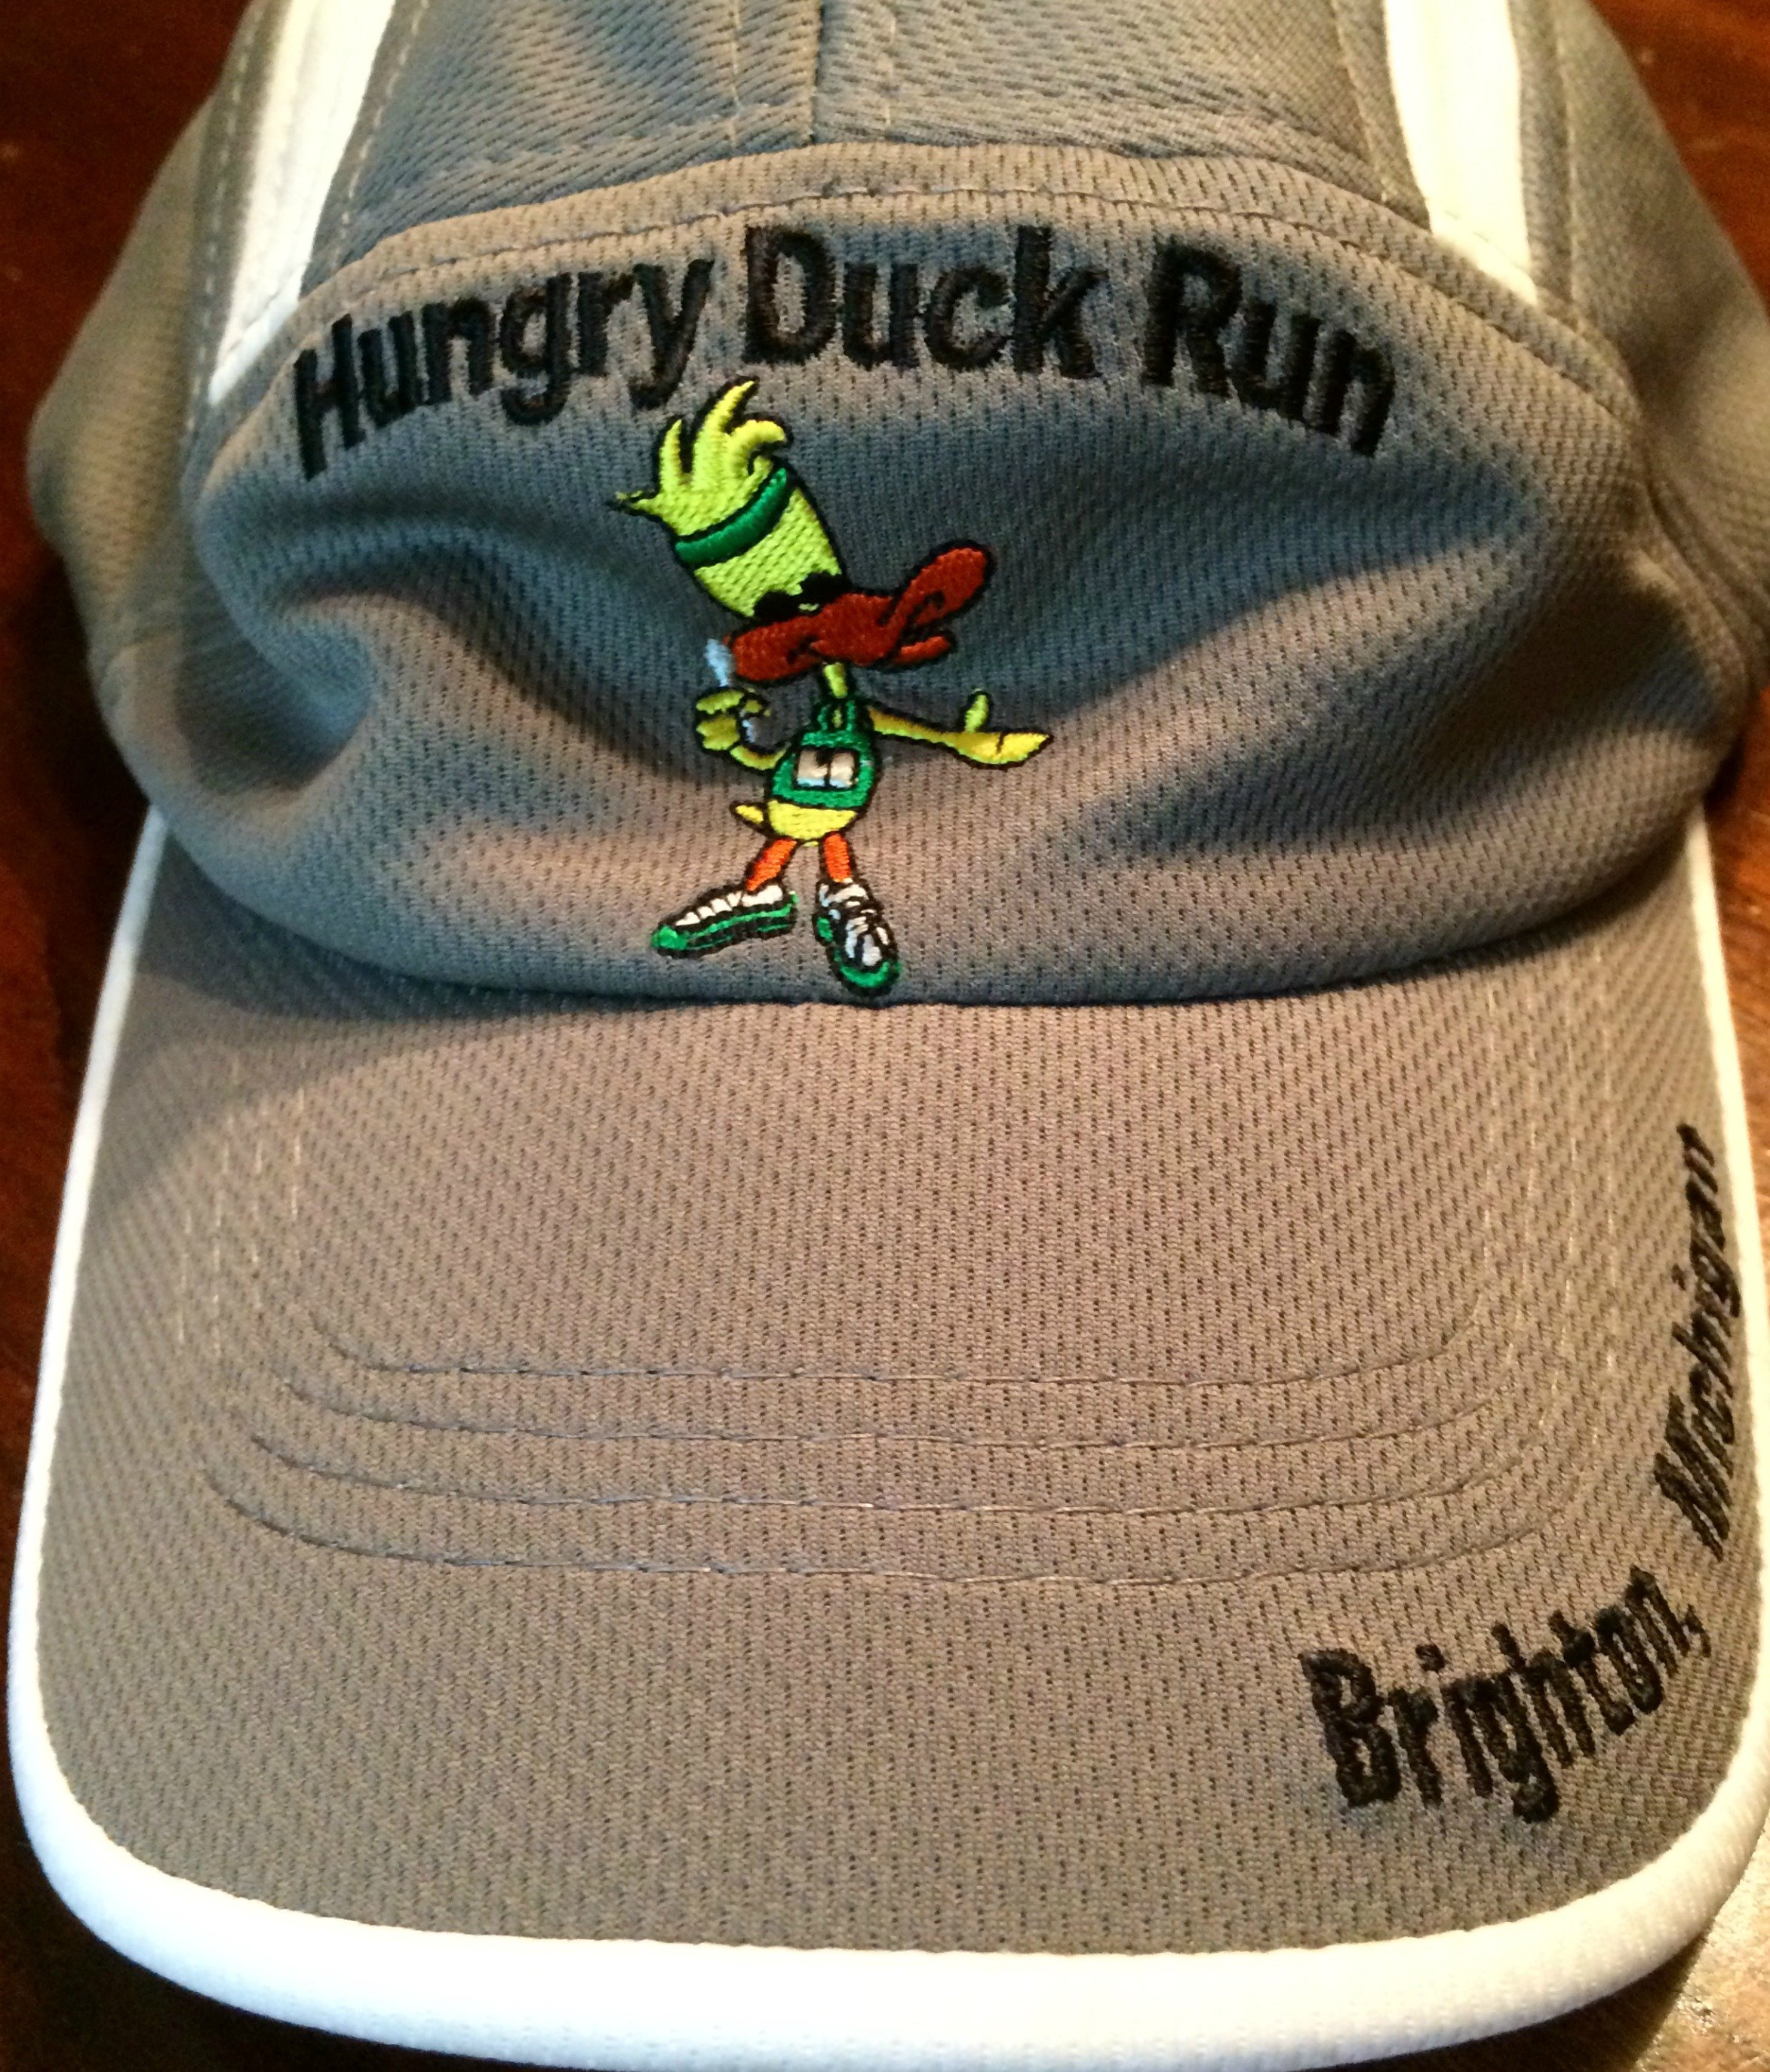 hungry duck run hat